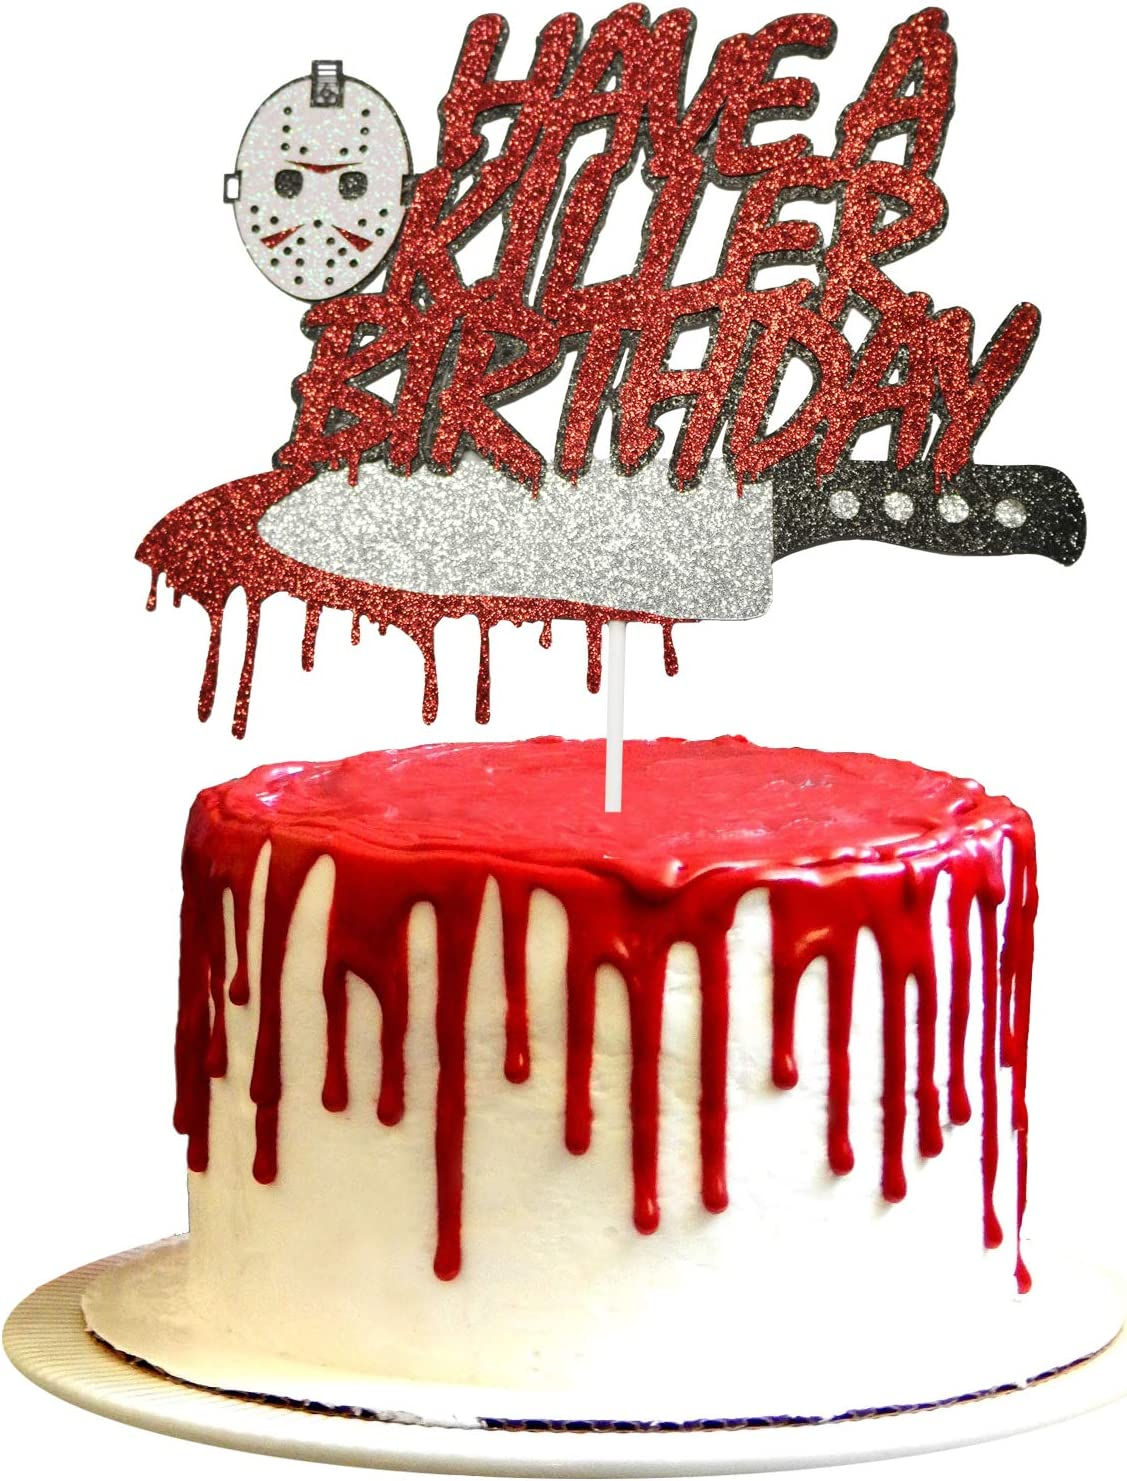 Have A Killer Birthday Cake Topper Halloween Jason Birthday Party Decorations Halloween Birthday Cake Topper Horror Movie Party Supplies Halloween Zombie Vampire Party Decorations